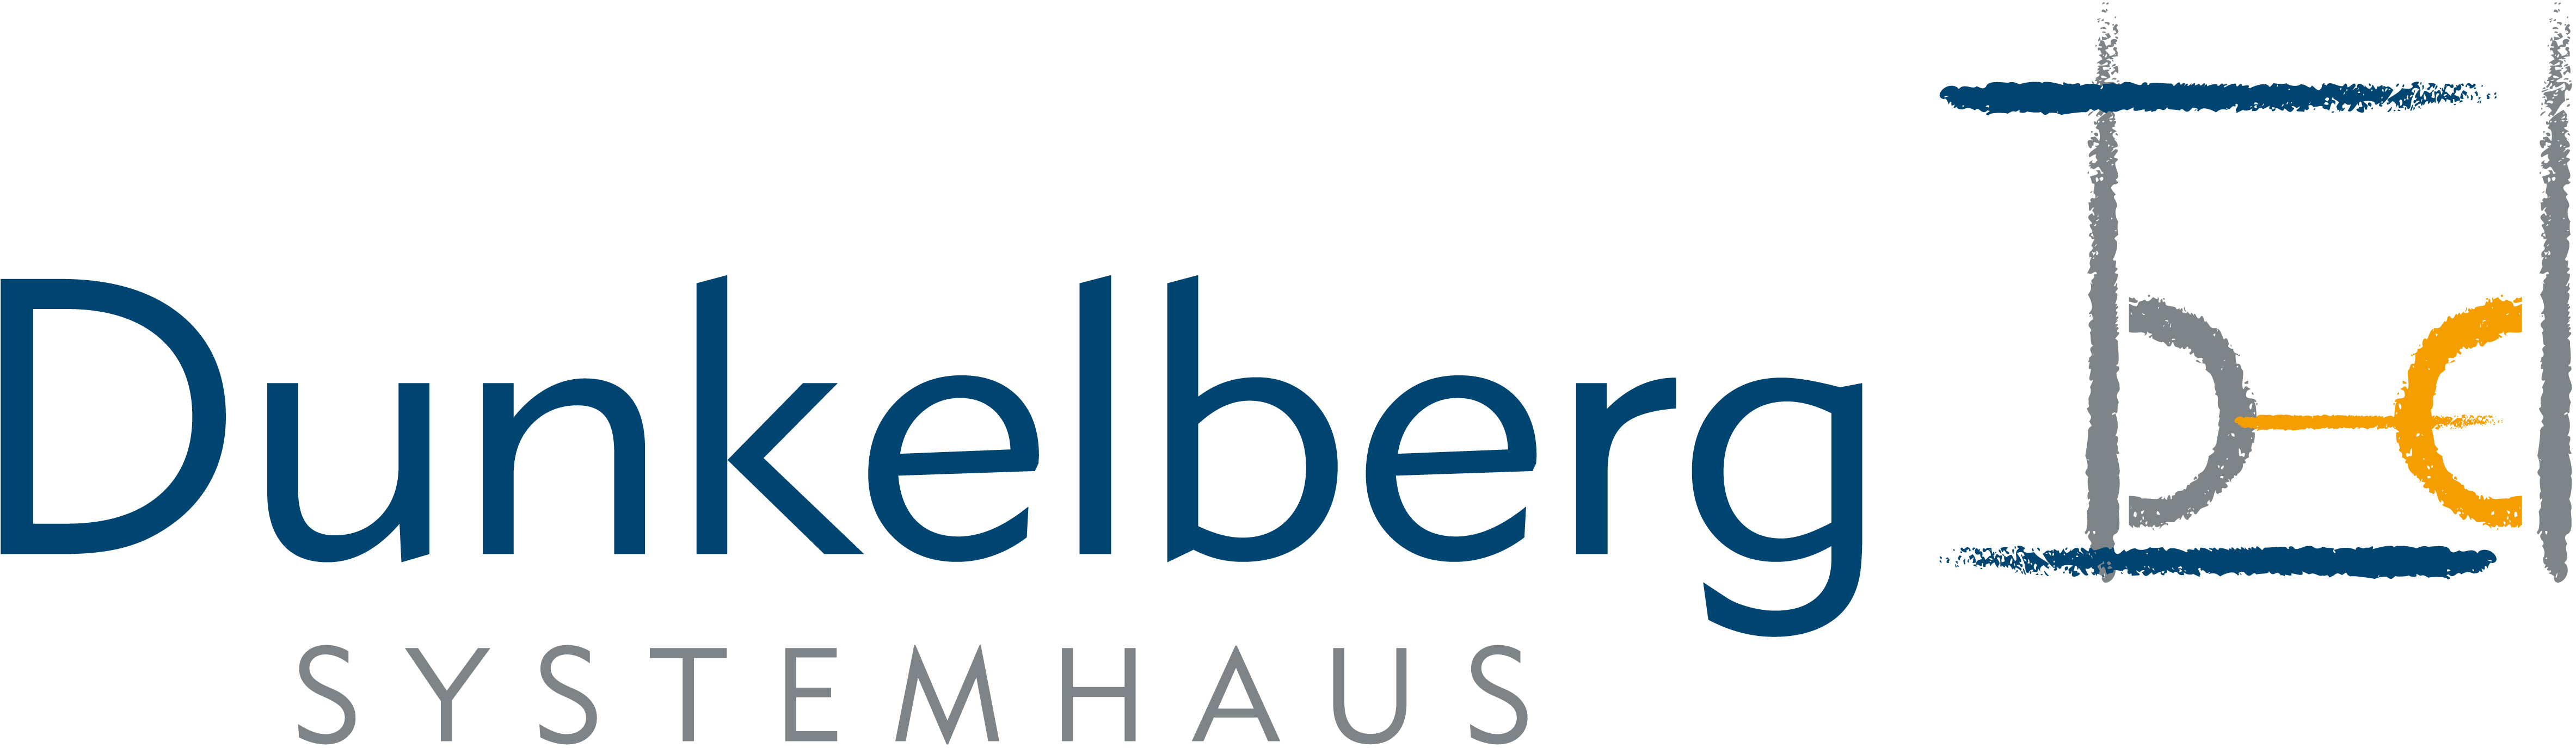 Dunkelberg Systemhaus GmbH